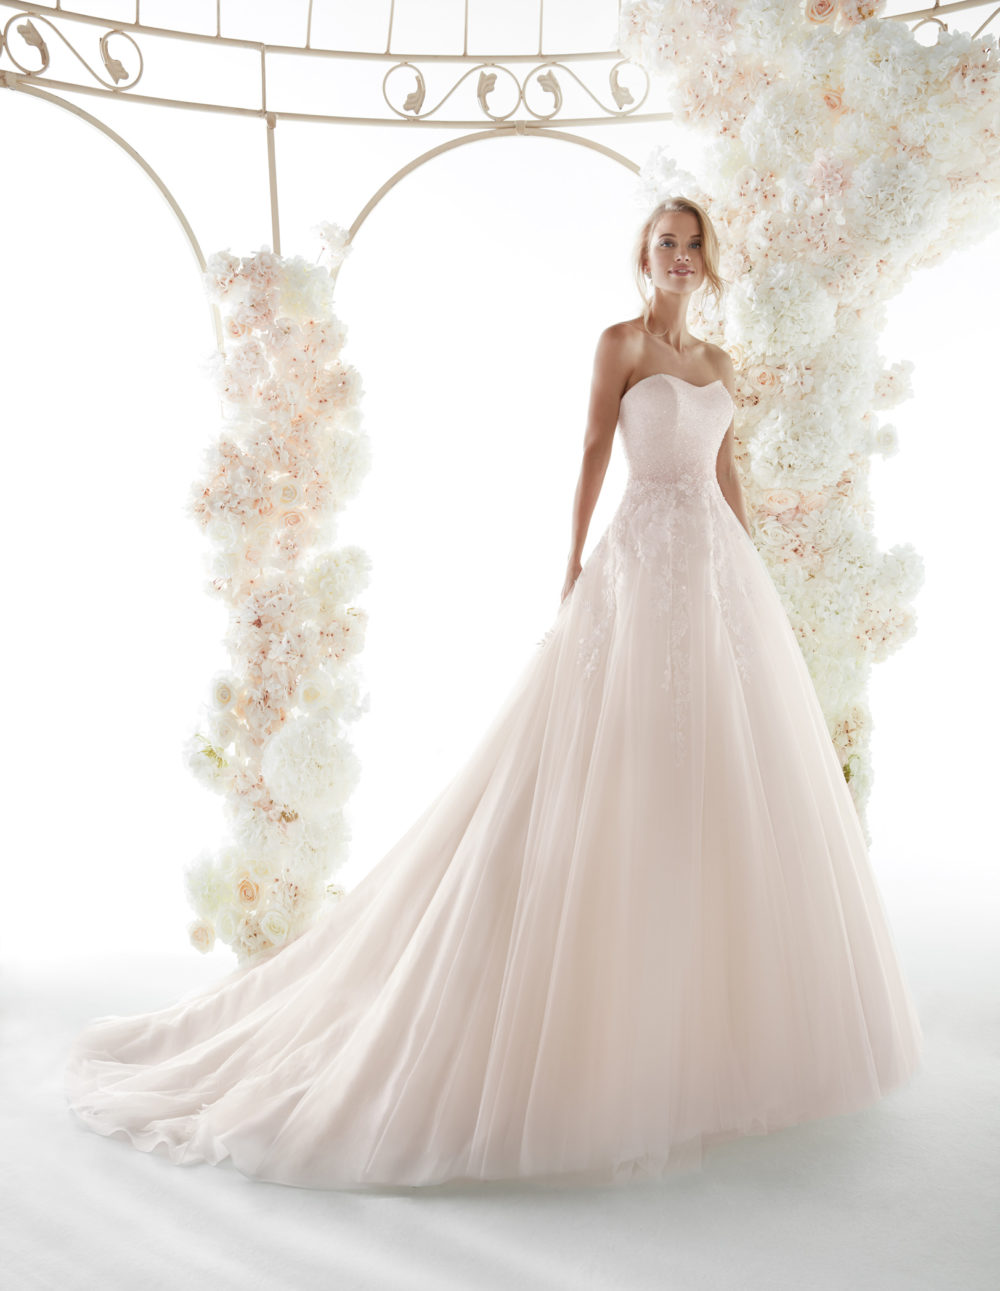 Mariages: abito da sposa Colet 2020 a Vicenza, Verona, Padova, Veneto COA20411